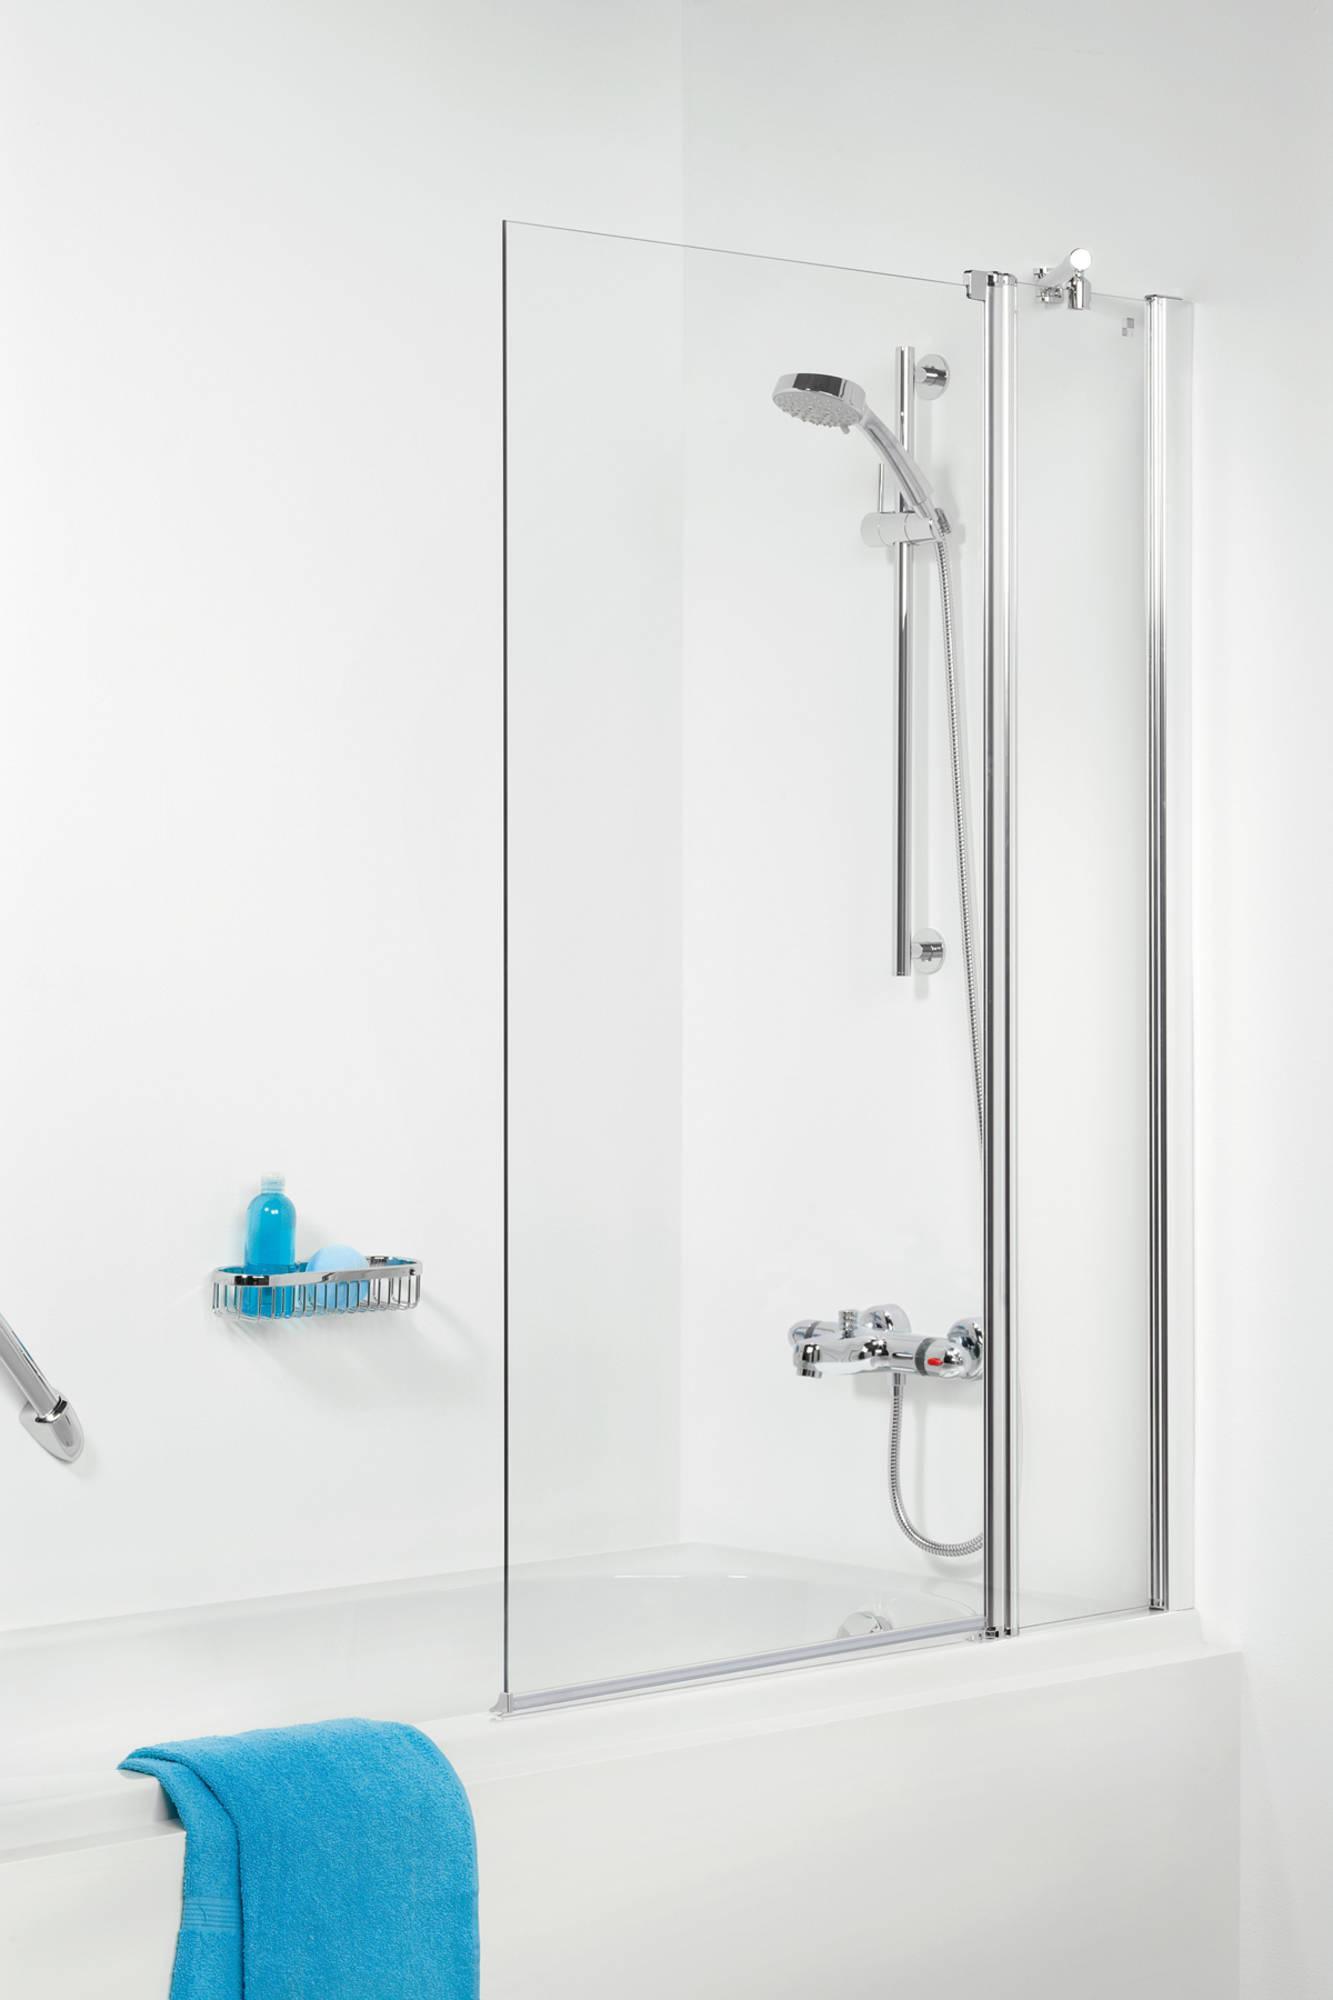 Get Wet 105 SH-BW100 Badwand met 6mm helder veiligheidsglas